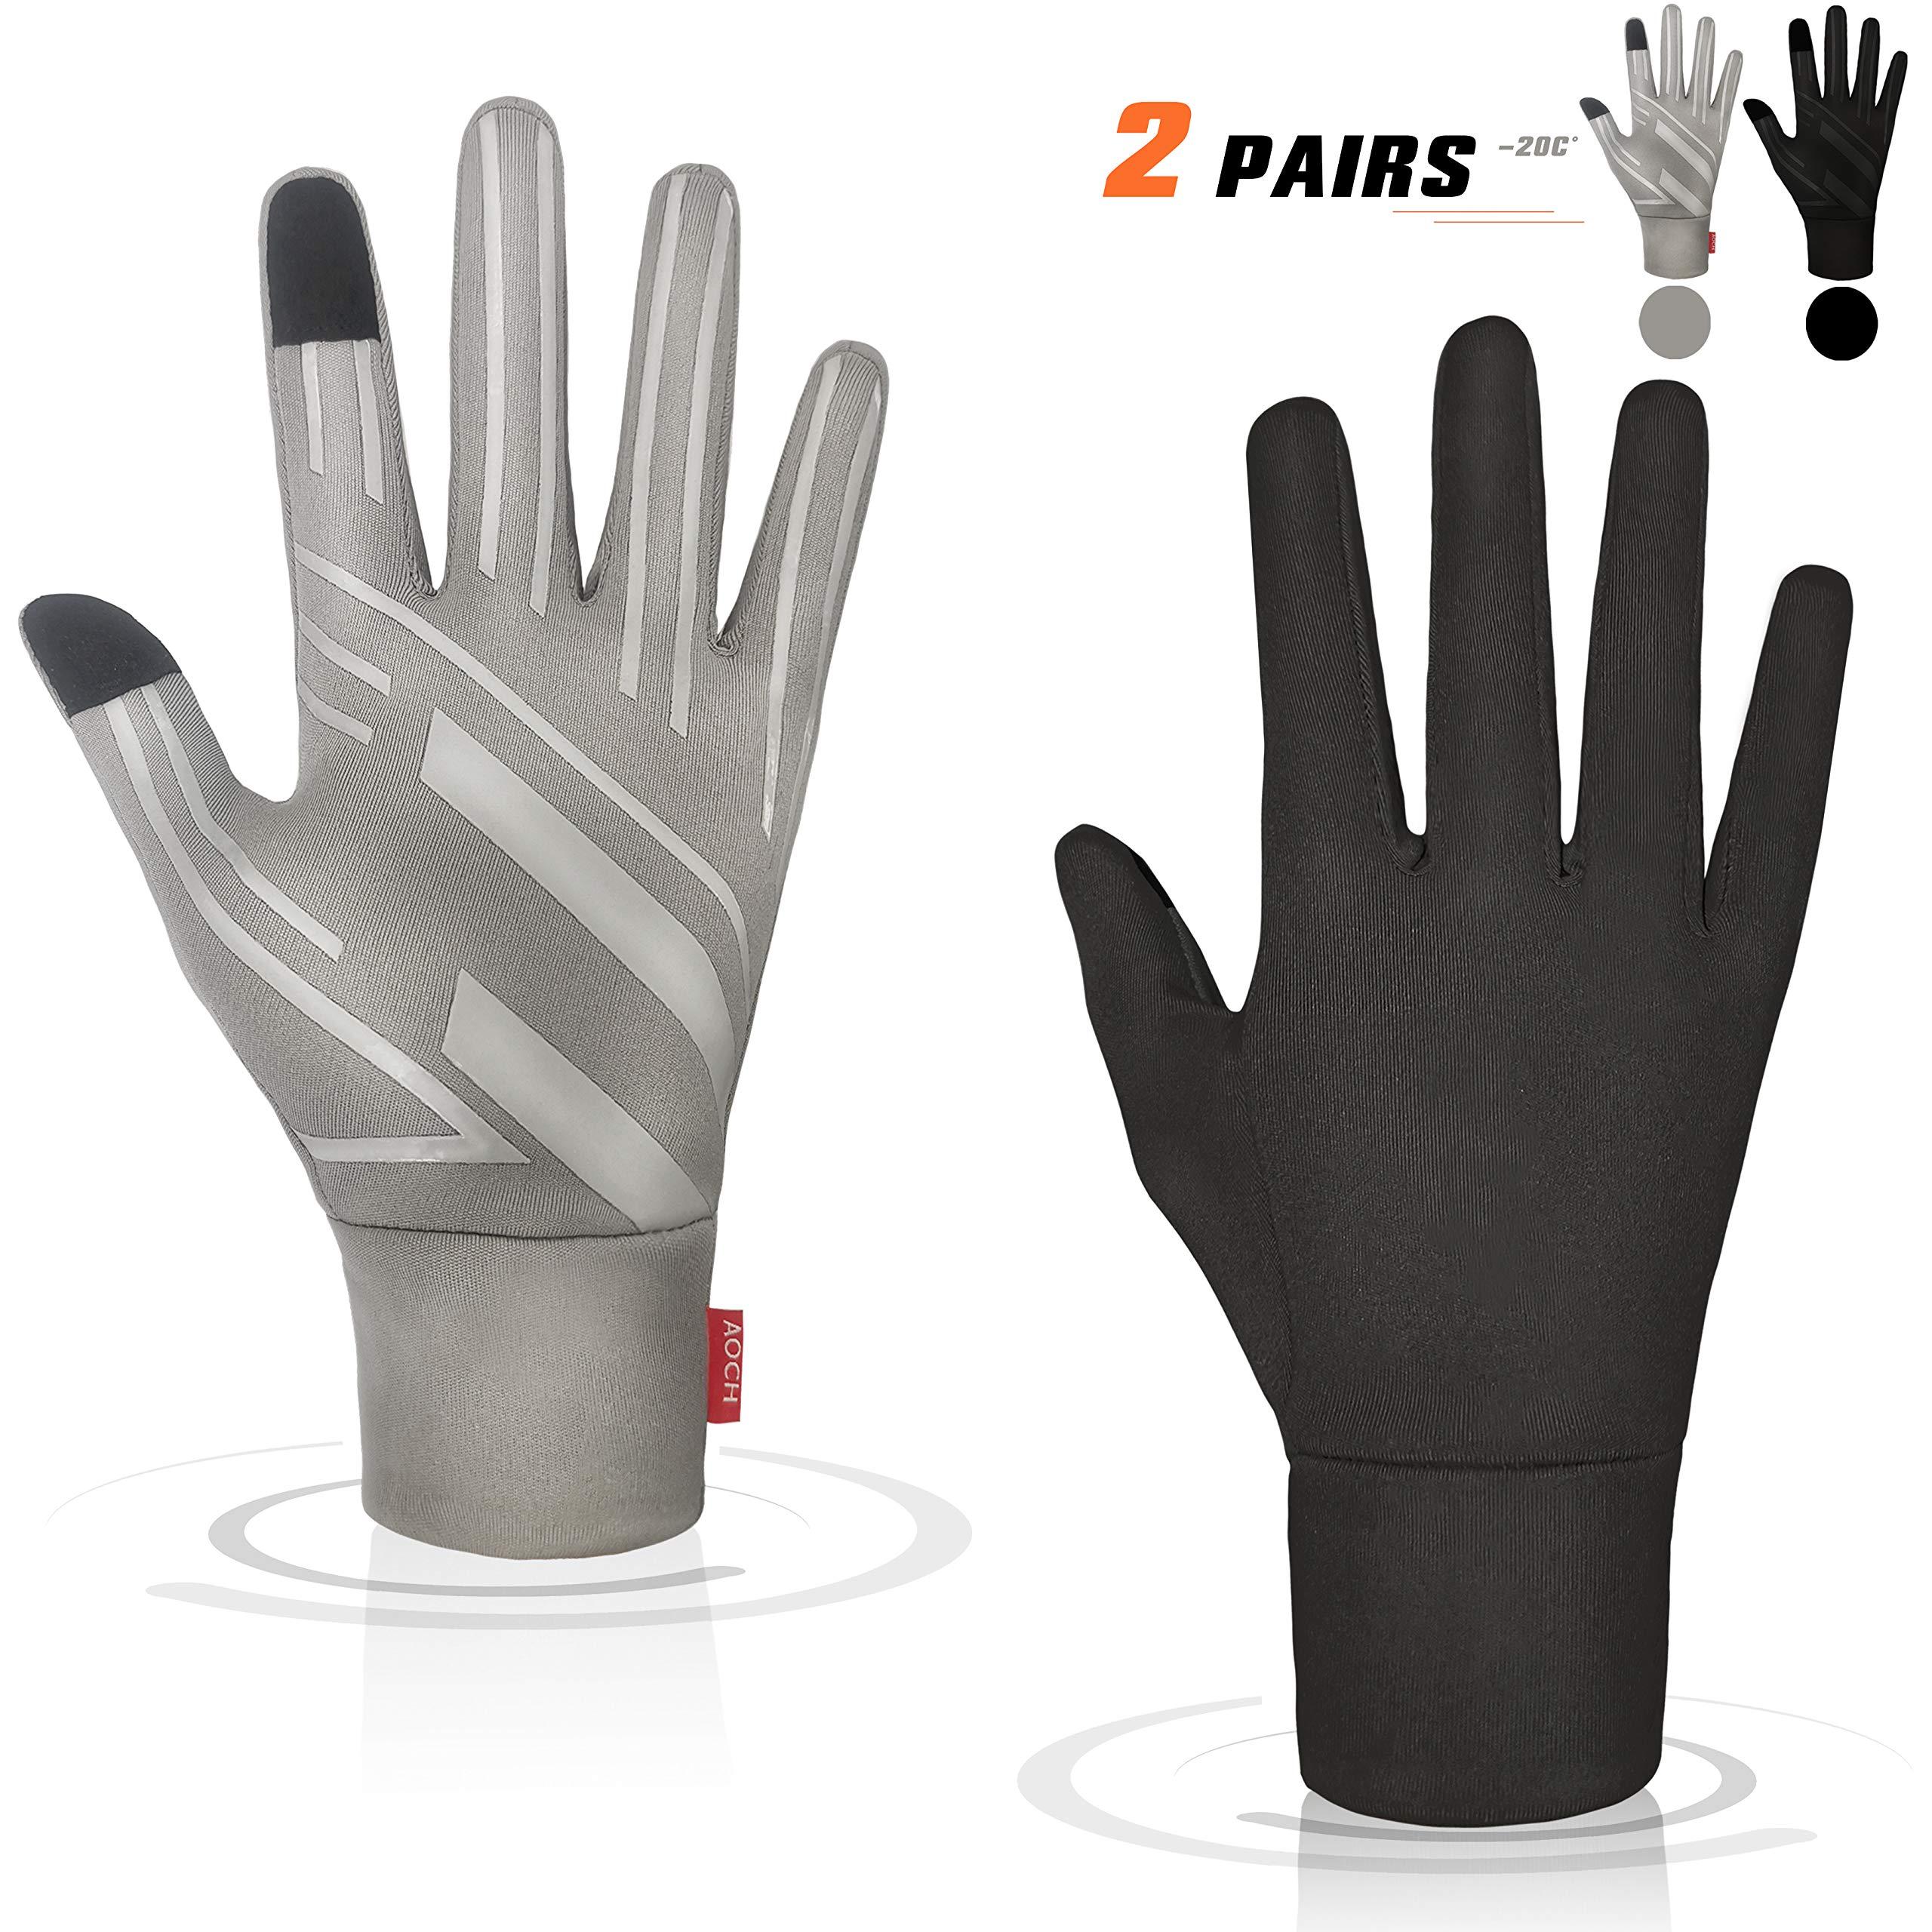 AOCH Running Thermal Gloves - Touch Screen Gloves Lightweight Warm Winter Gloves - 2 Pairs